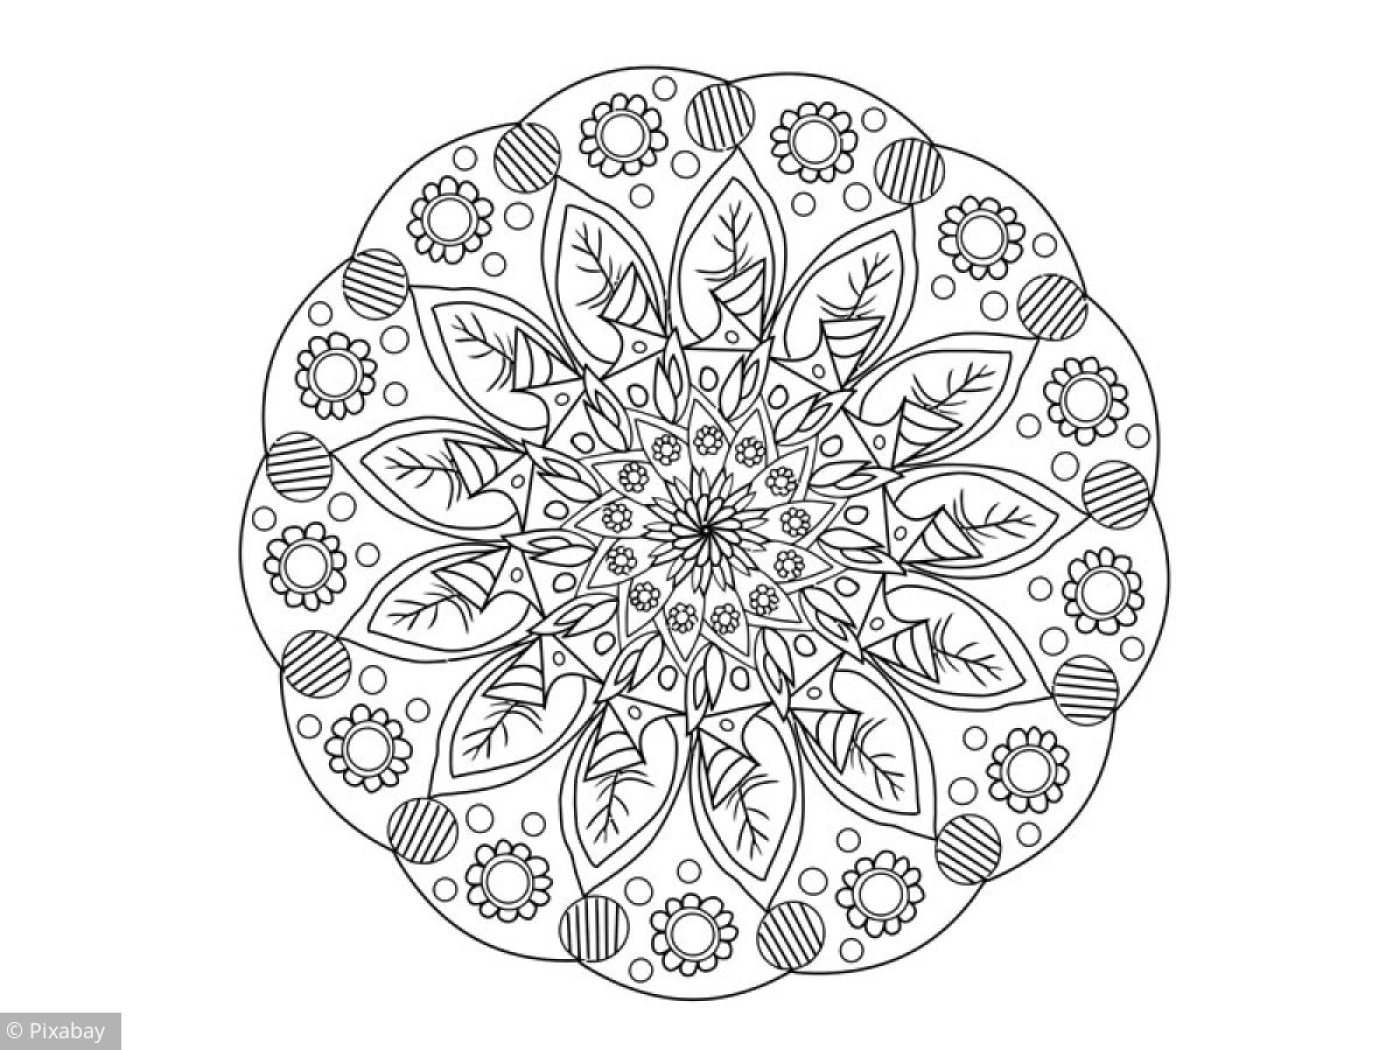 Coloriage Mandala Fleuri avec Jeux De Coloriage Mandala